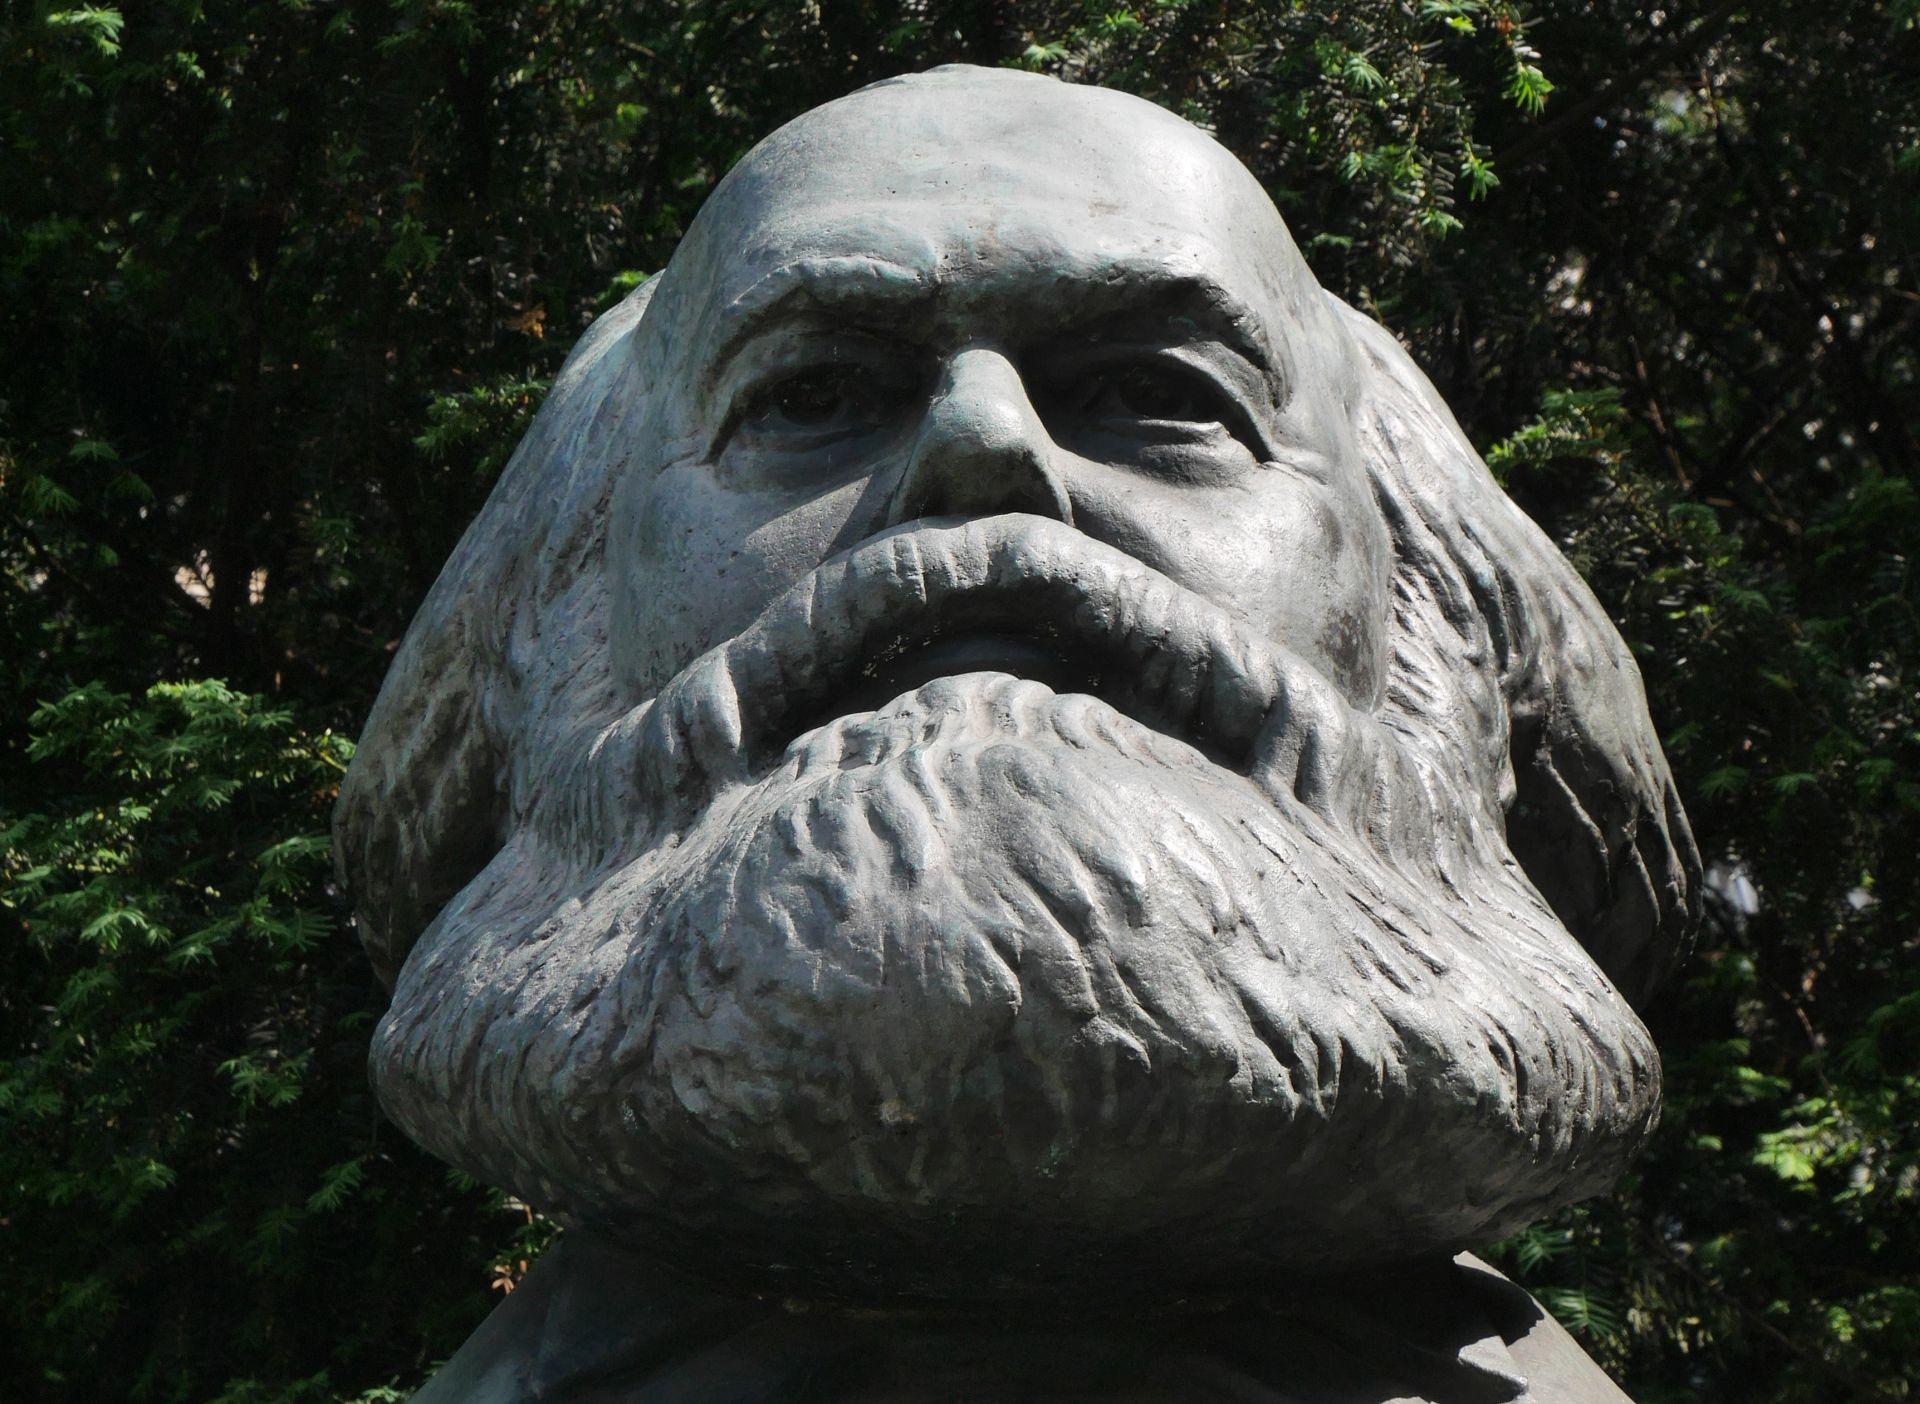 FELJTON Kako su ekonomske krize oživjele ideje Karla Marxa